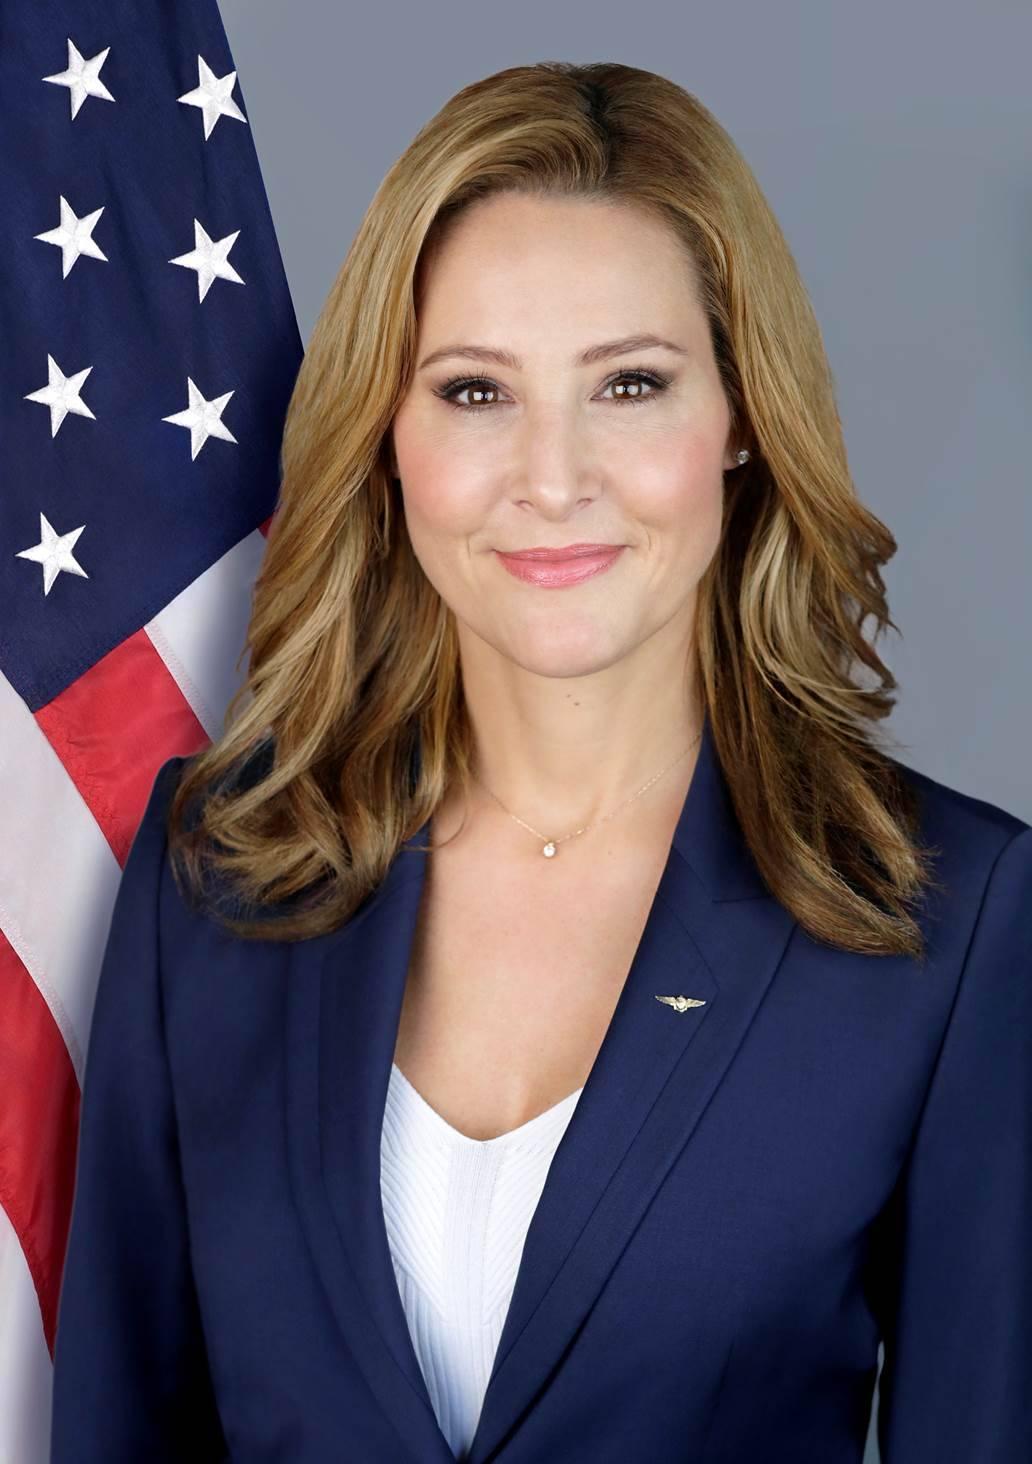 U.S. GEC's special envoy and coordinator Lea Gabrielle